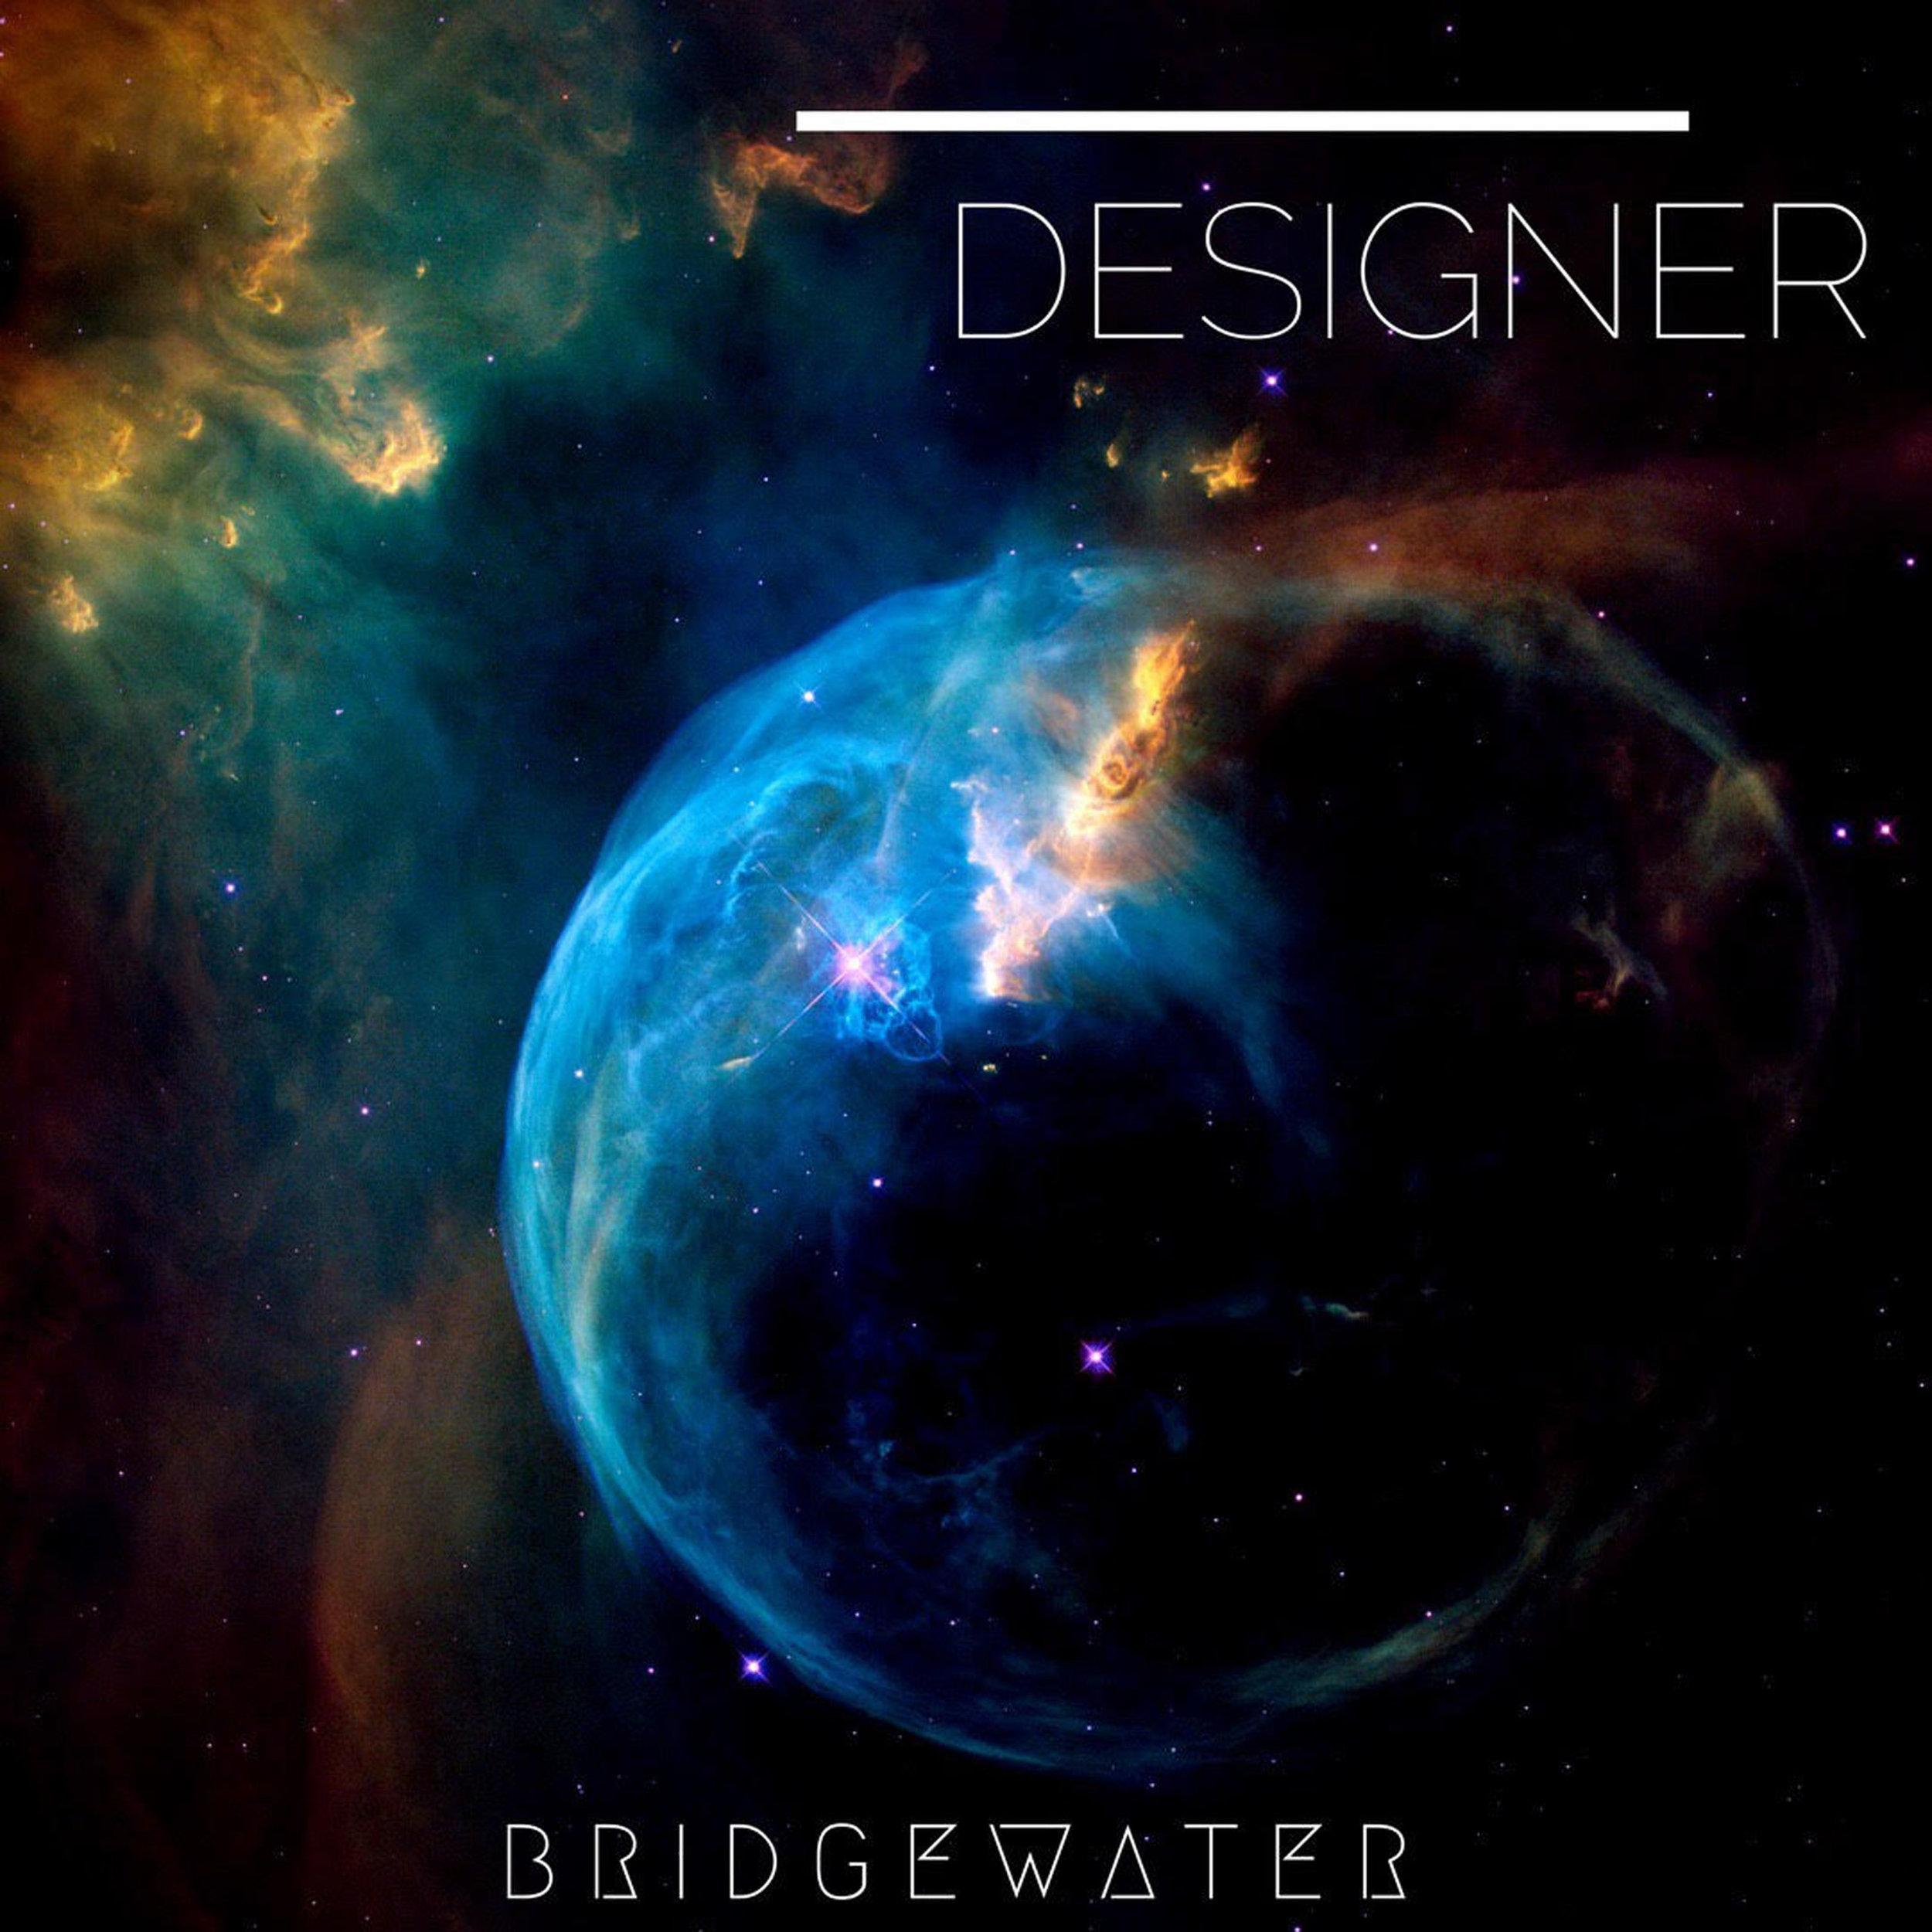 Designer-Bridgewater-Single Cover Art -3000x3000.jpg